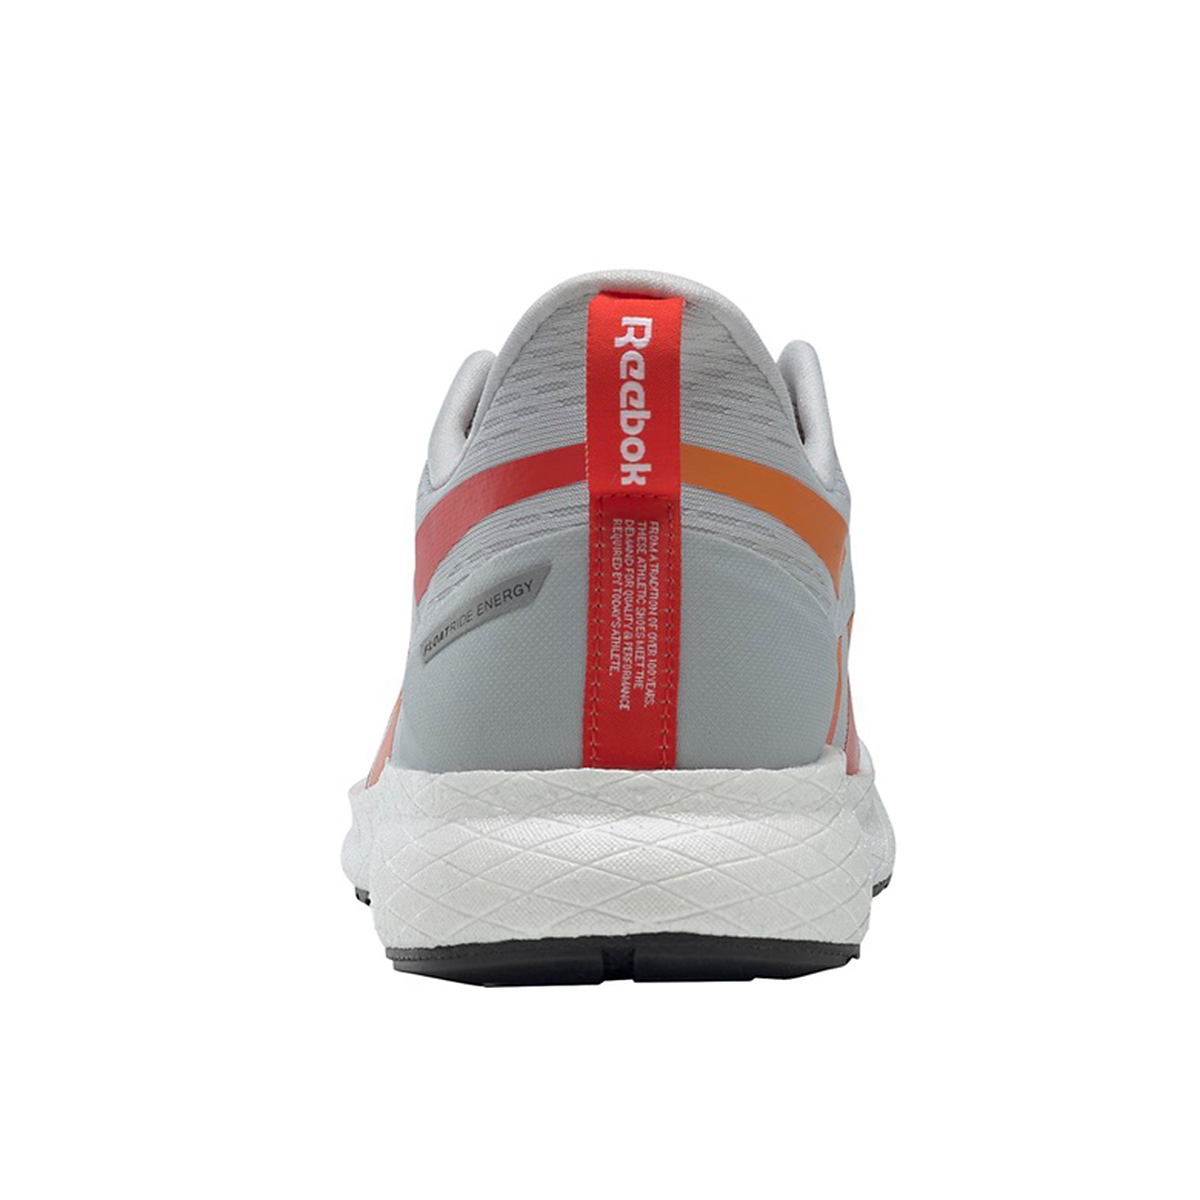 Men's Reebok Forever Floatride Energy 2.0 Running Shoe - Color: Pure Grey/White/High Vis Orange - Size: 7 - Width: Regular, Pure Grey/White/High Vis Orange, large, image 4